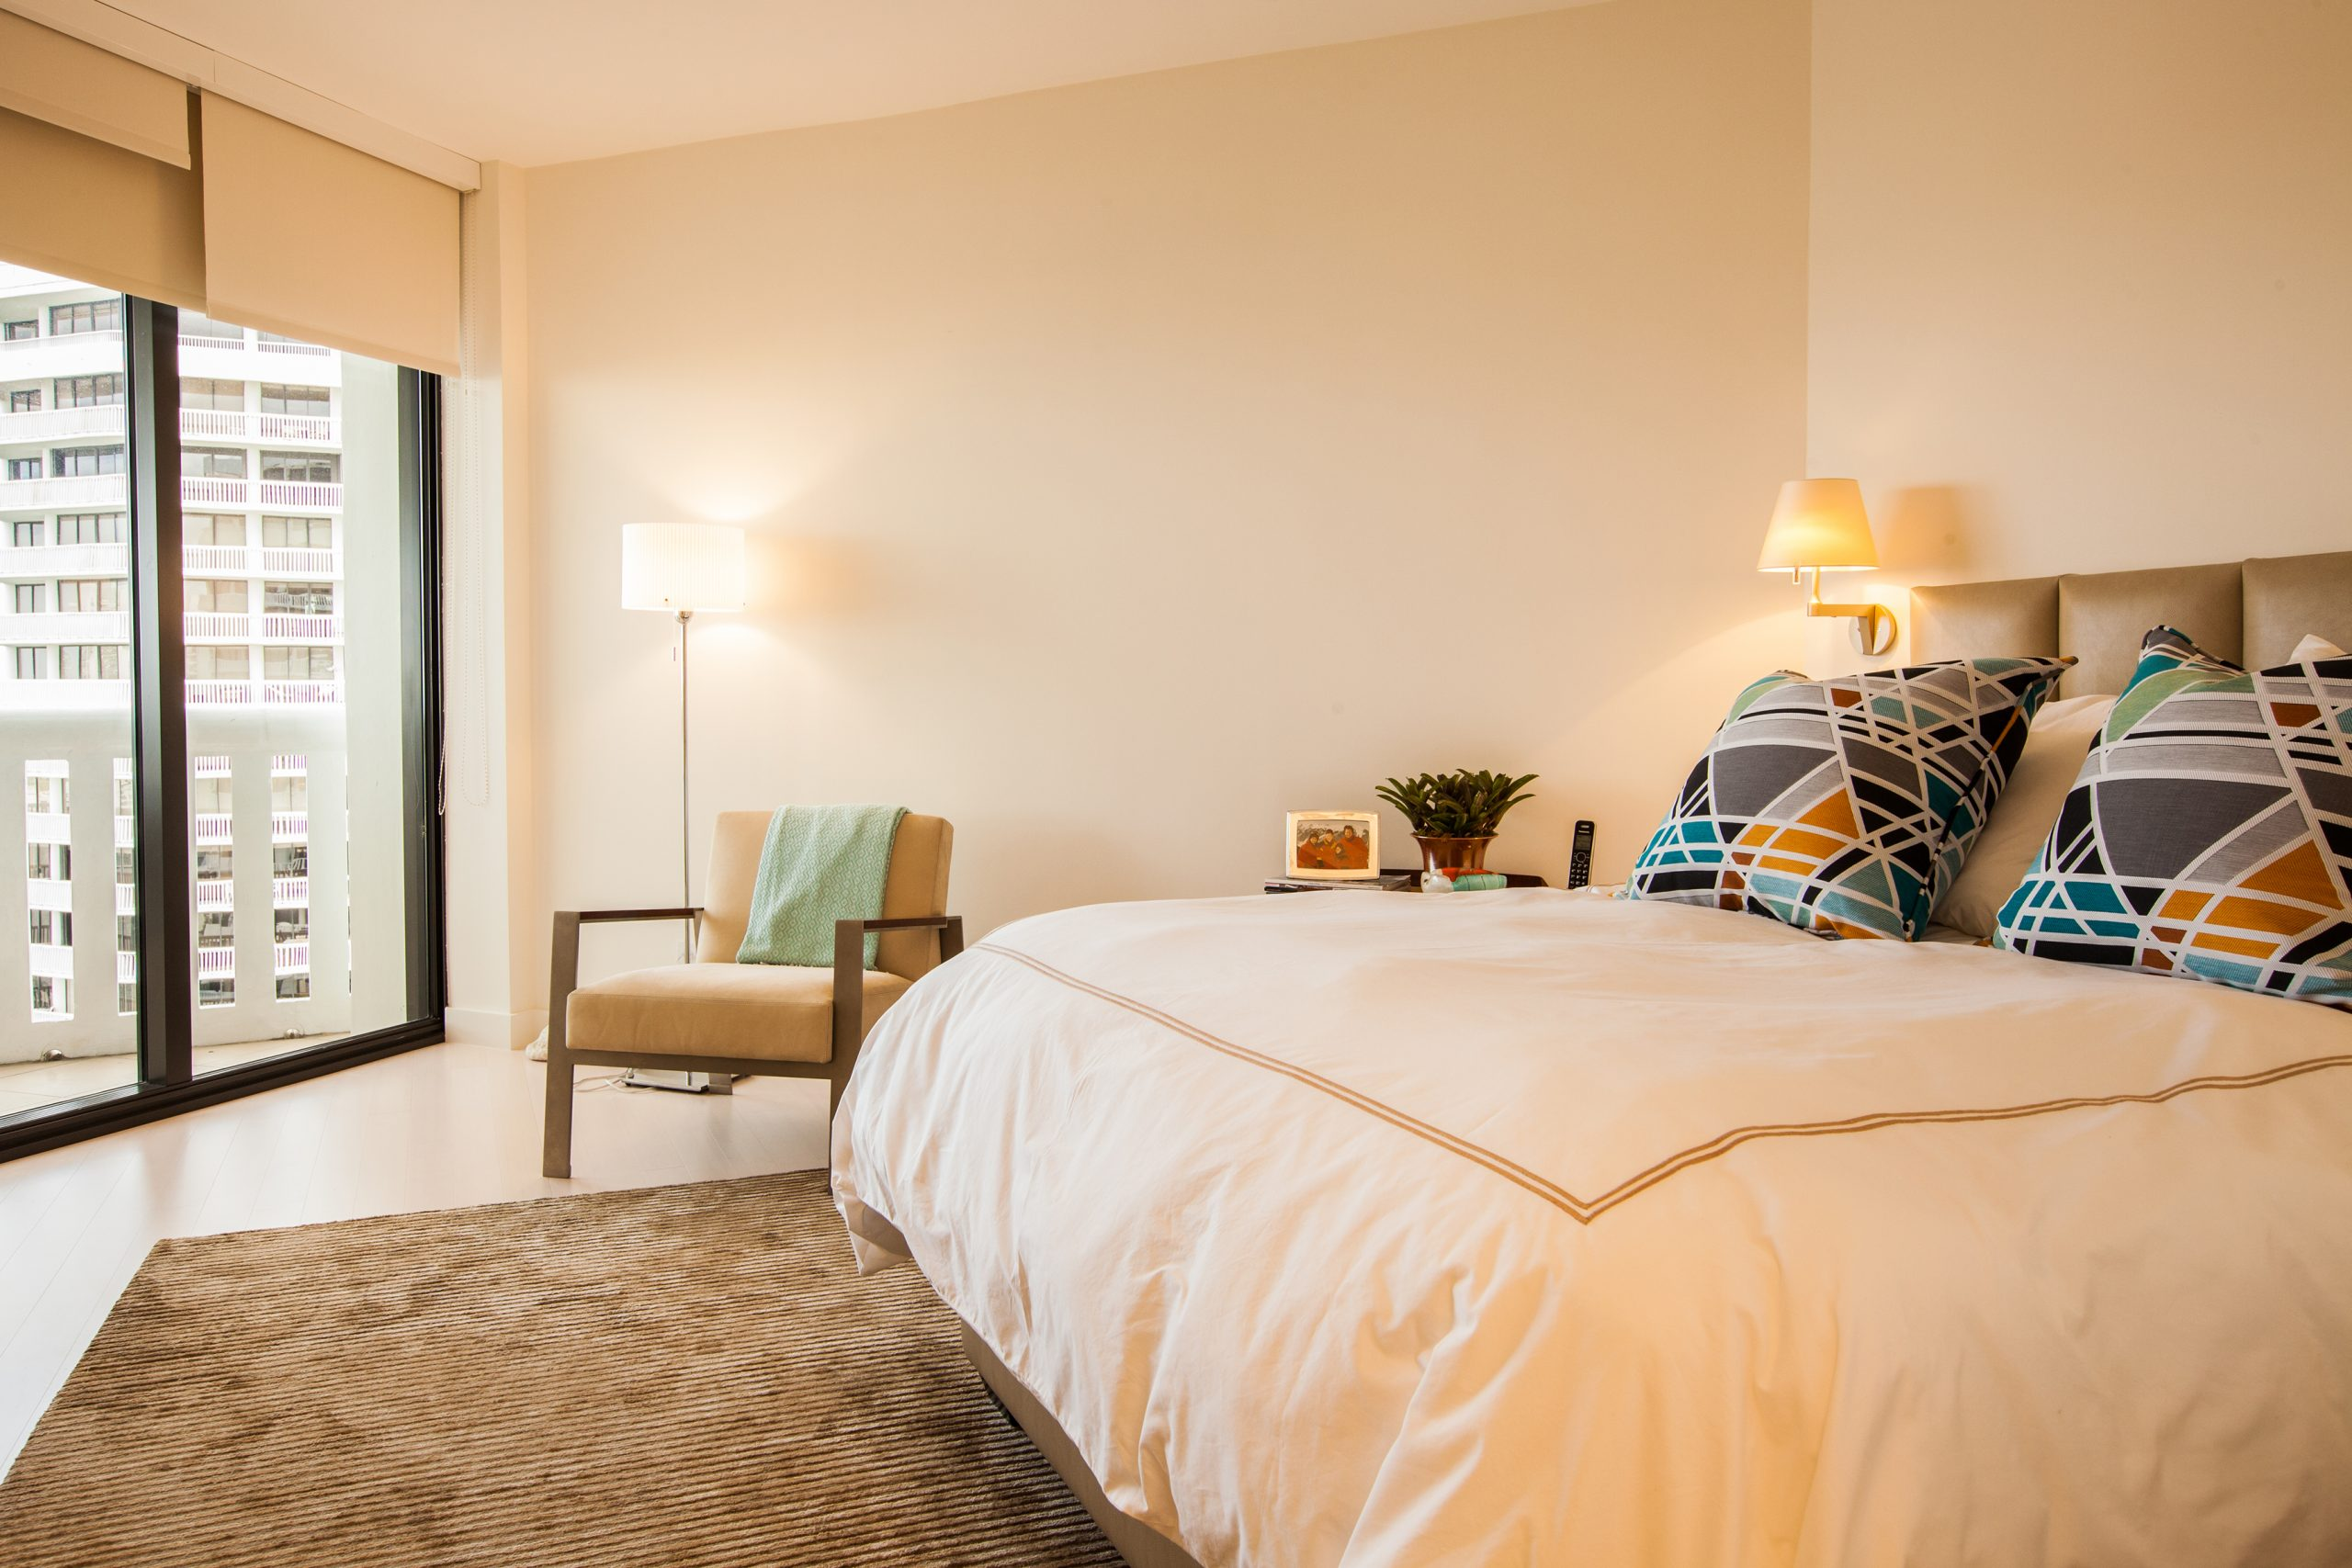 9.WI_Guest_Bedroom-scaled.jpg